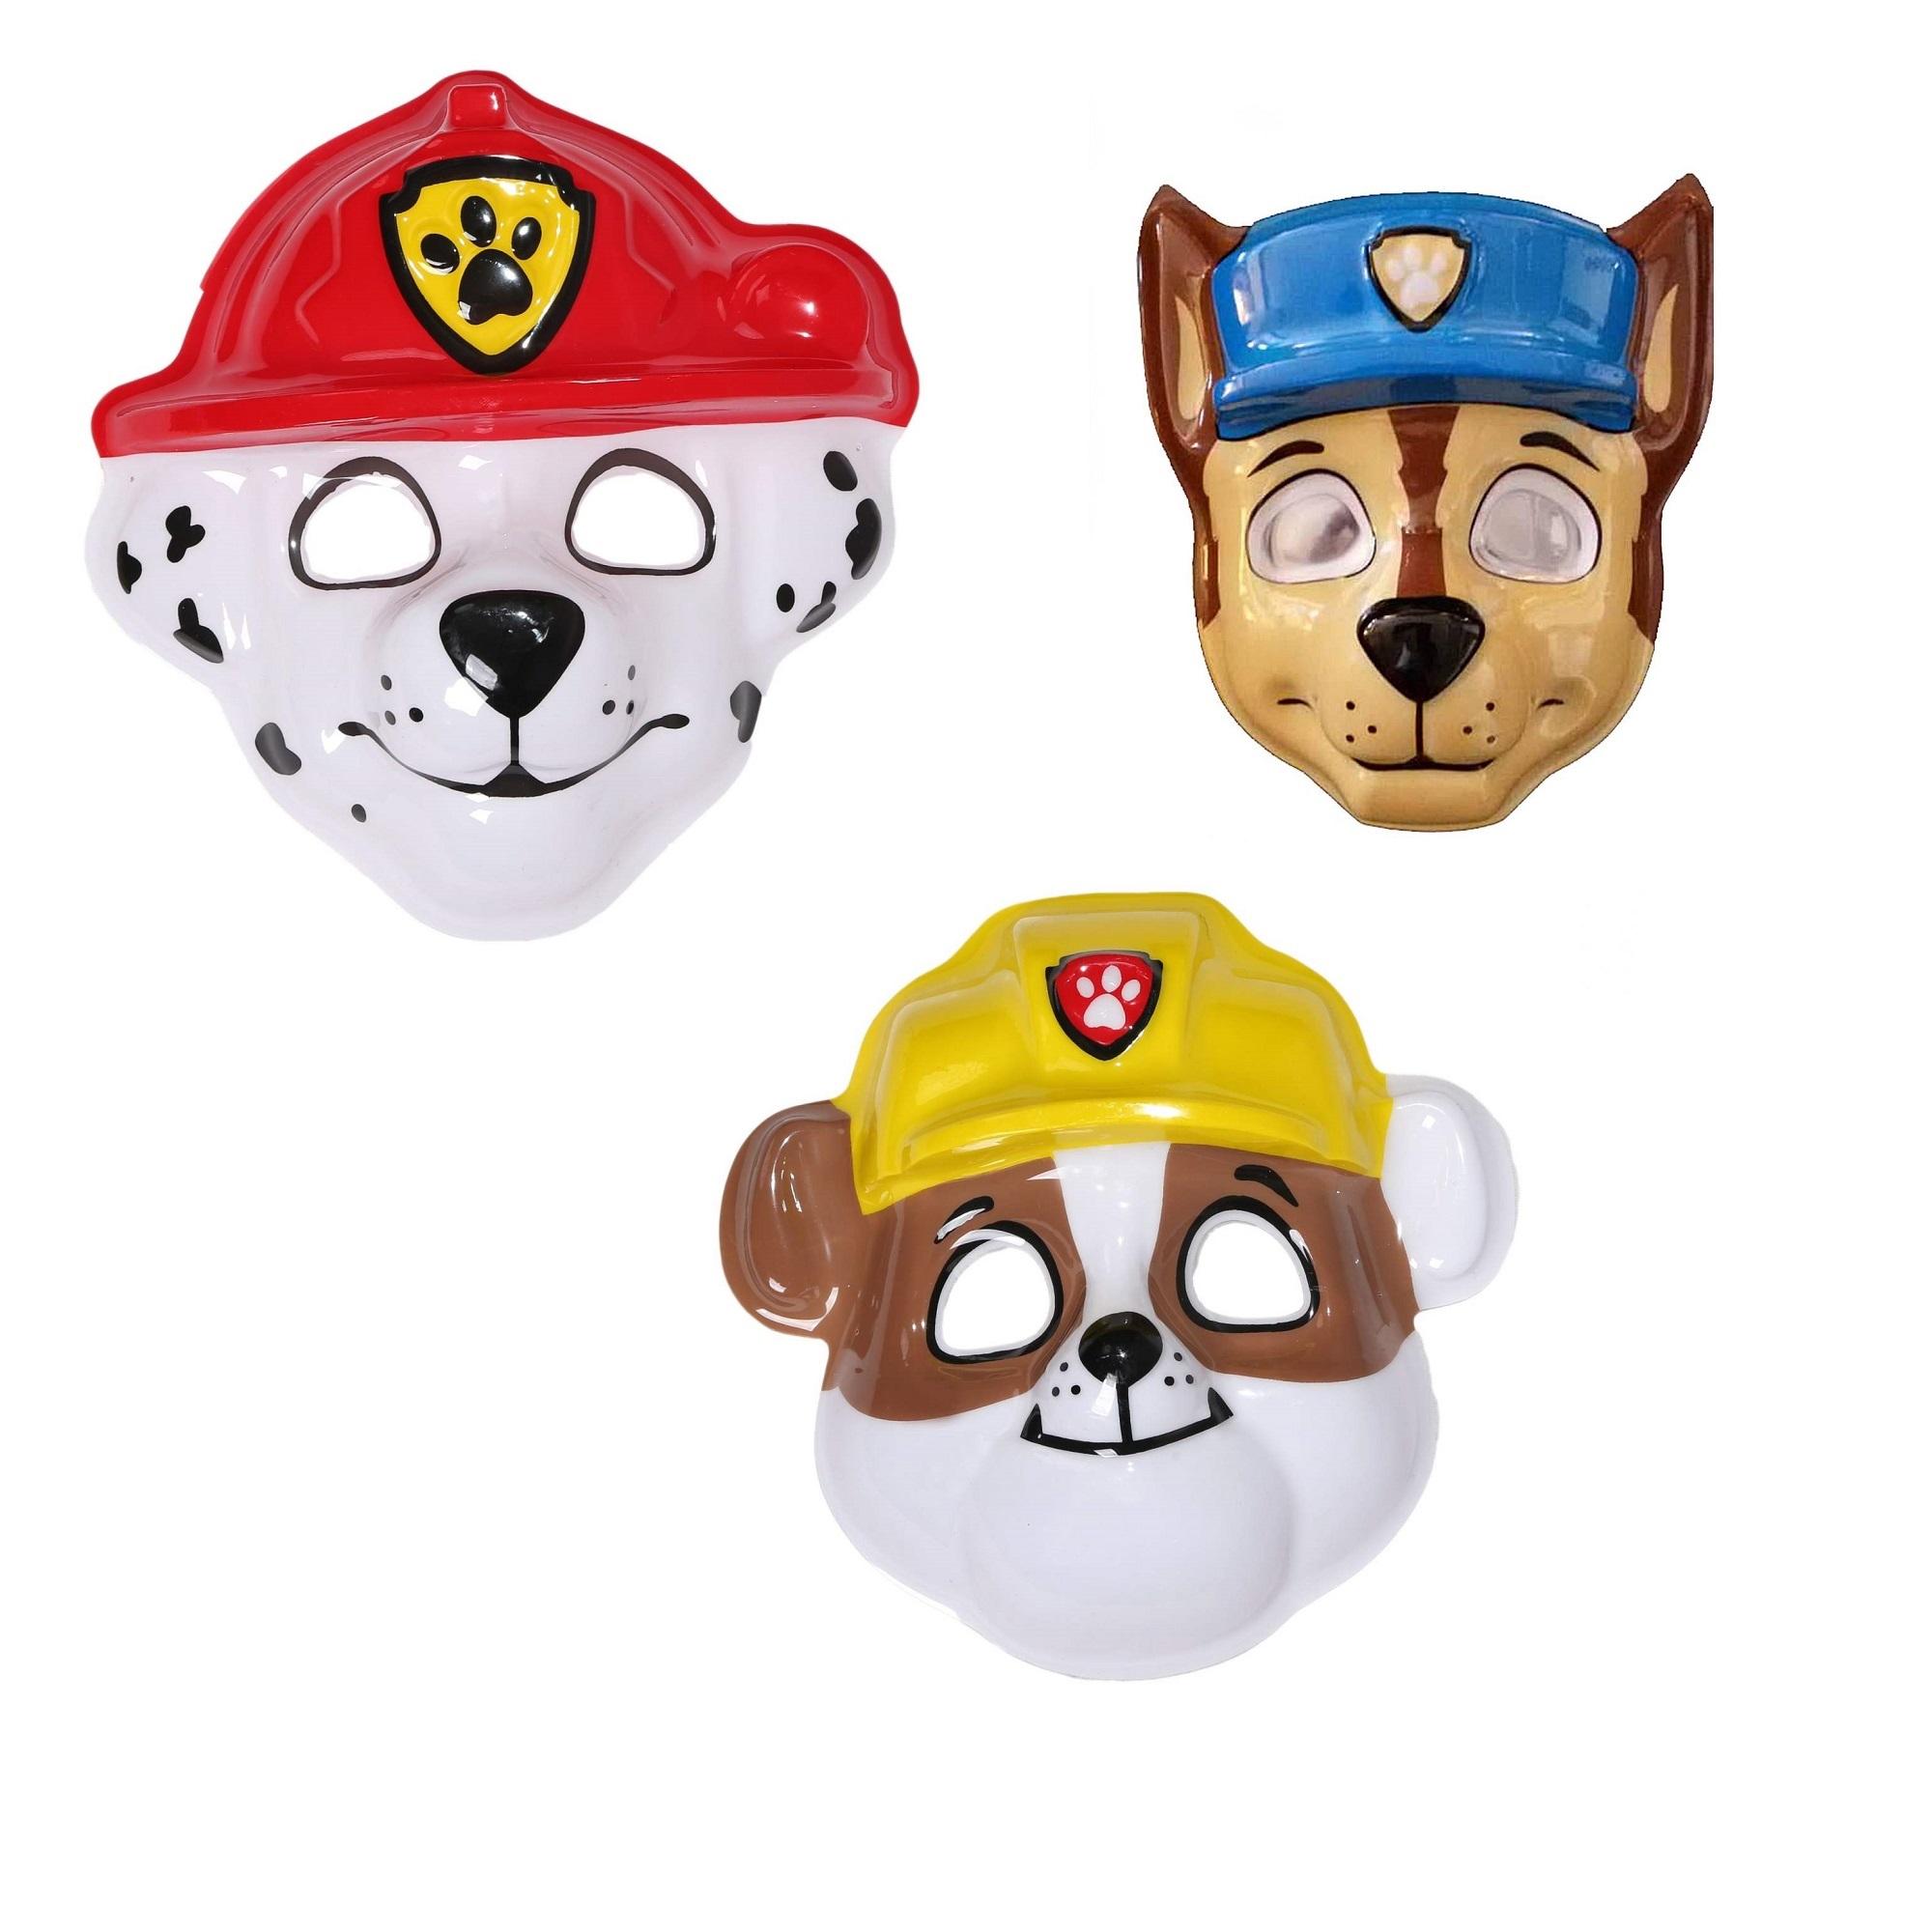 ماسک کودک طرح سگ نگهبان بسته 3 عددی